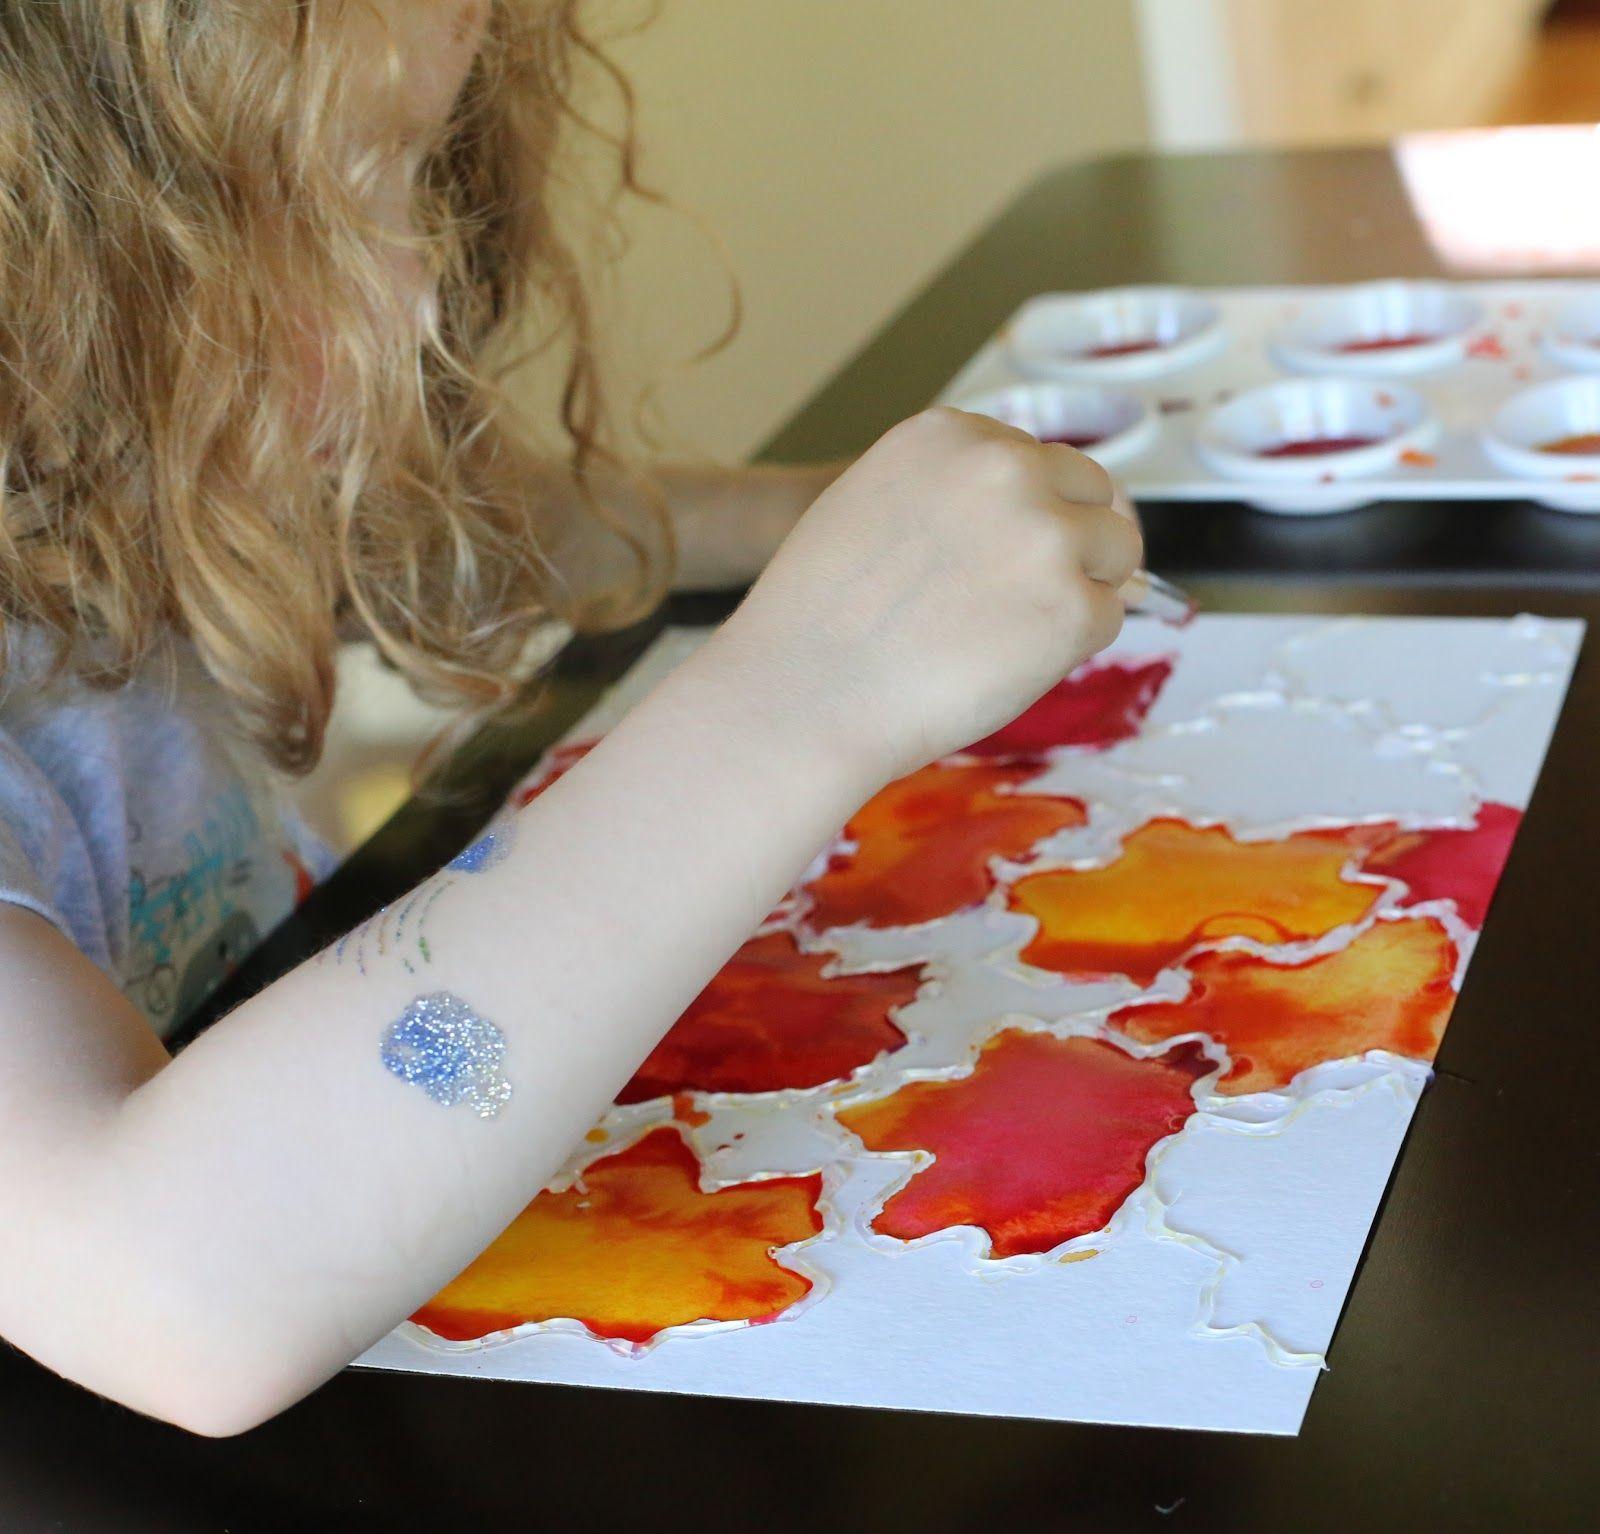 fall leaf watercolor resist art act man pinterest automne feuille automne et art. Black Bedroom Furniture Sets. Home Design Ideas